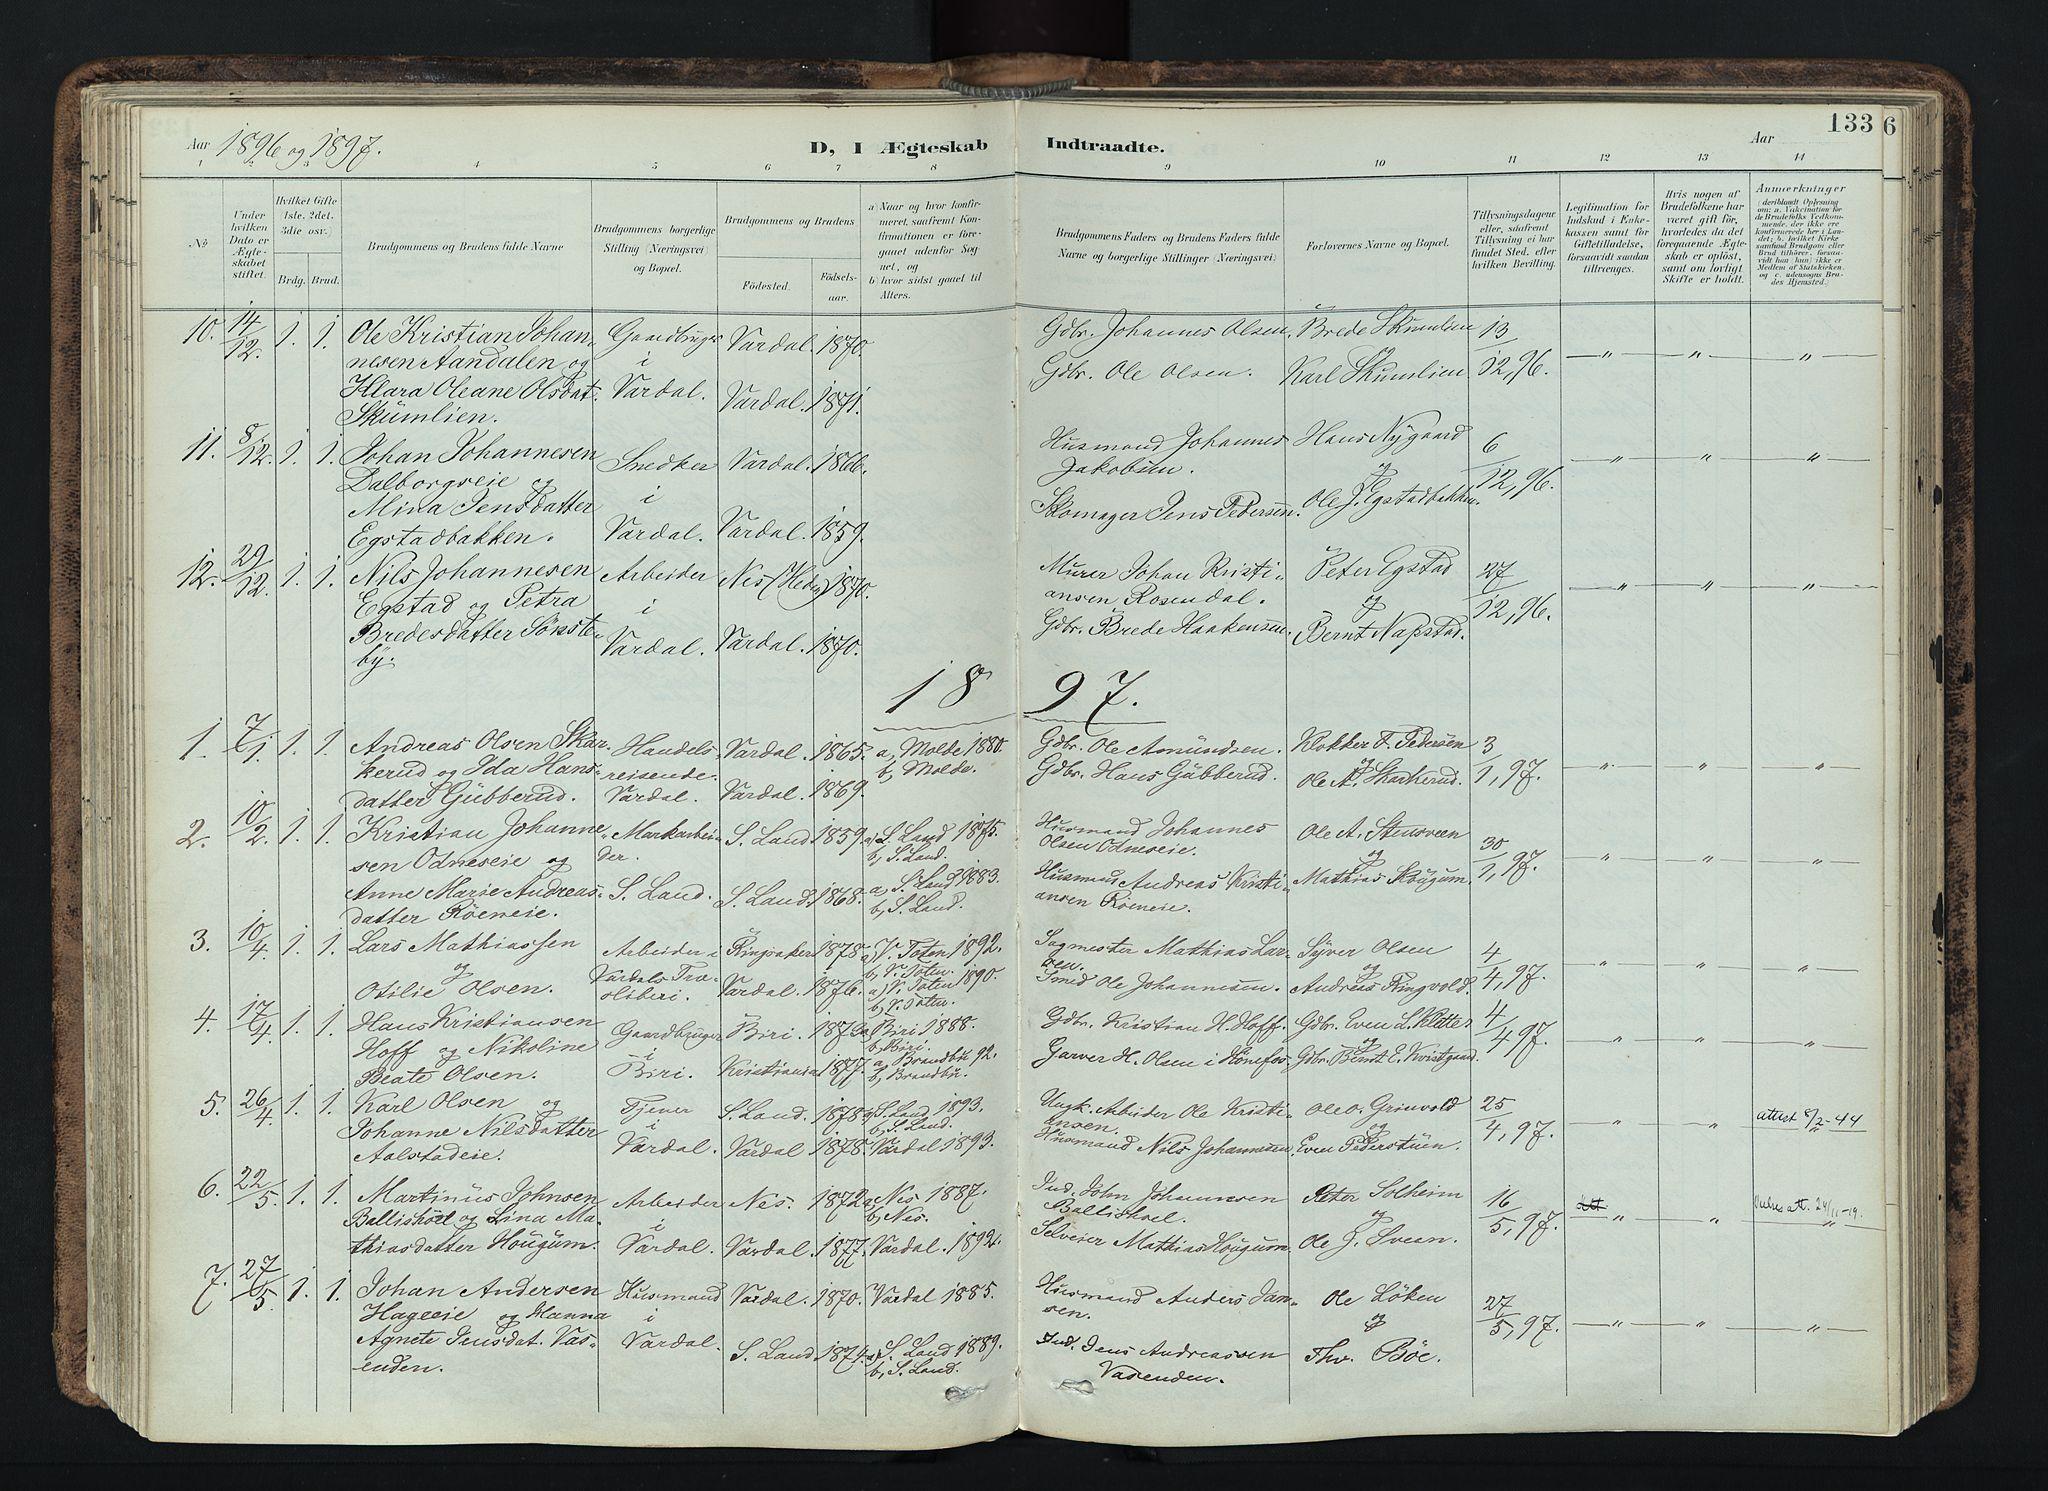 SAH, Vardal prestekontor, H/Ha/Haa/L0019: Ministerialbok nr. 19, 1893-1907, s. 133